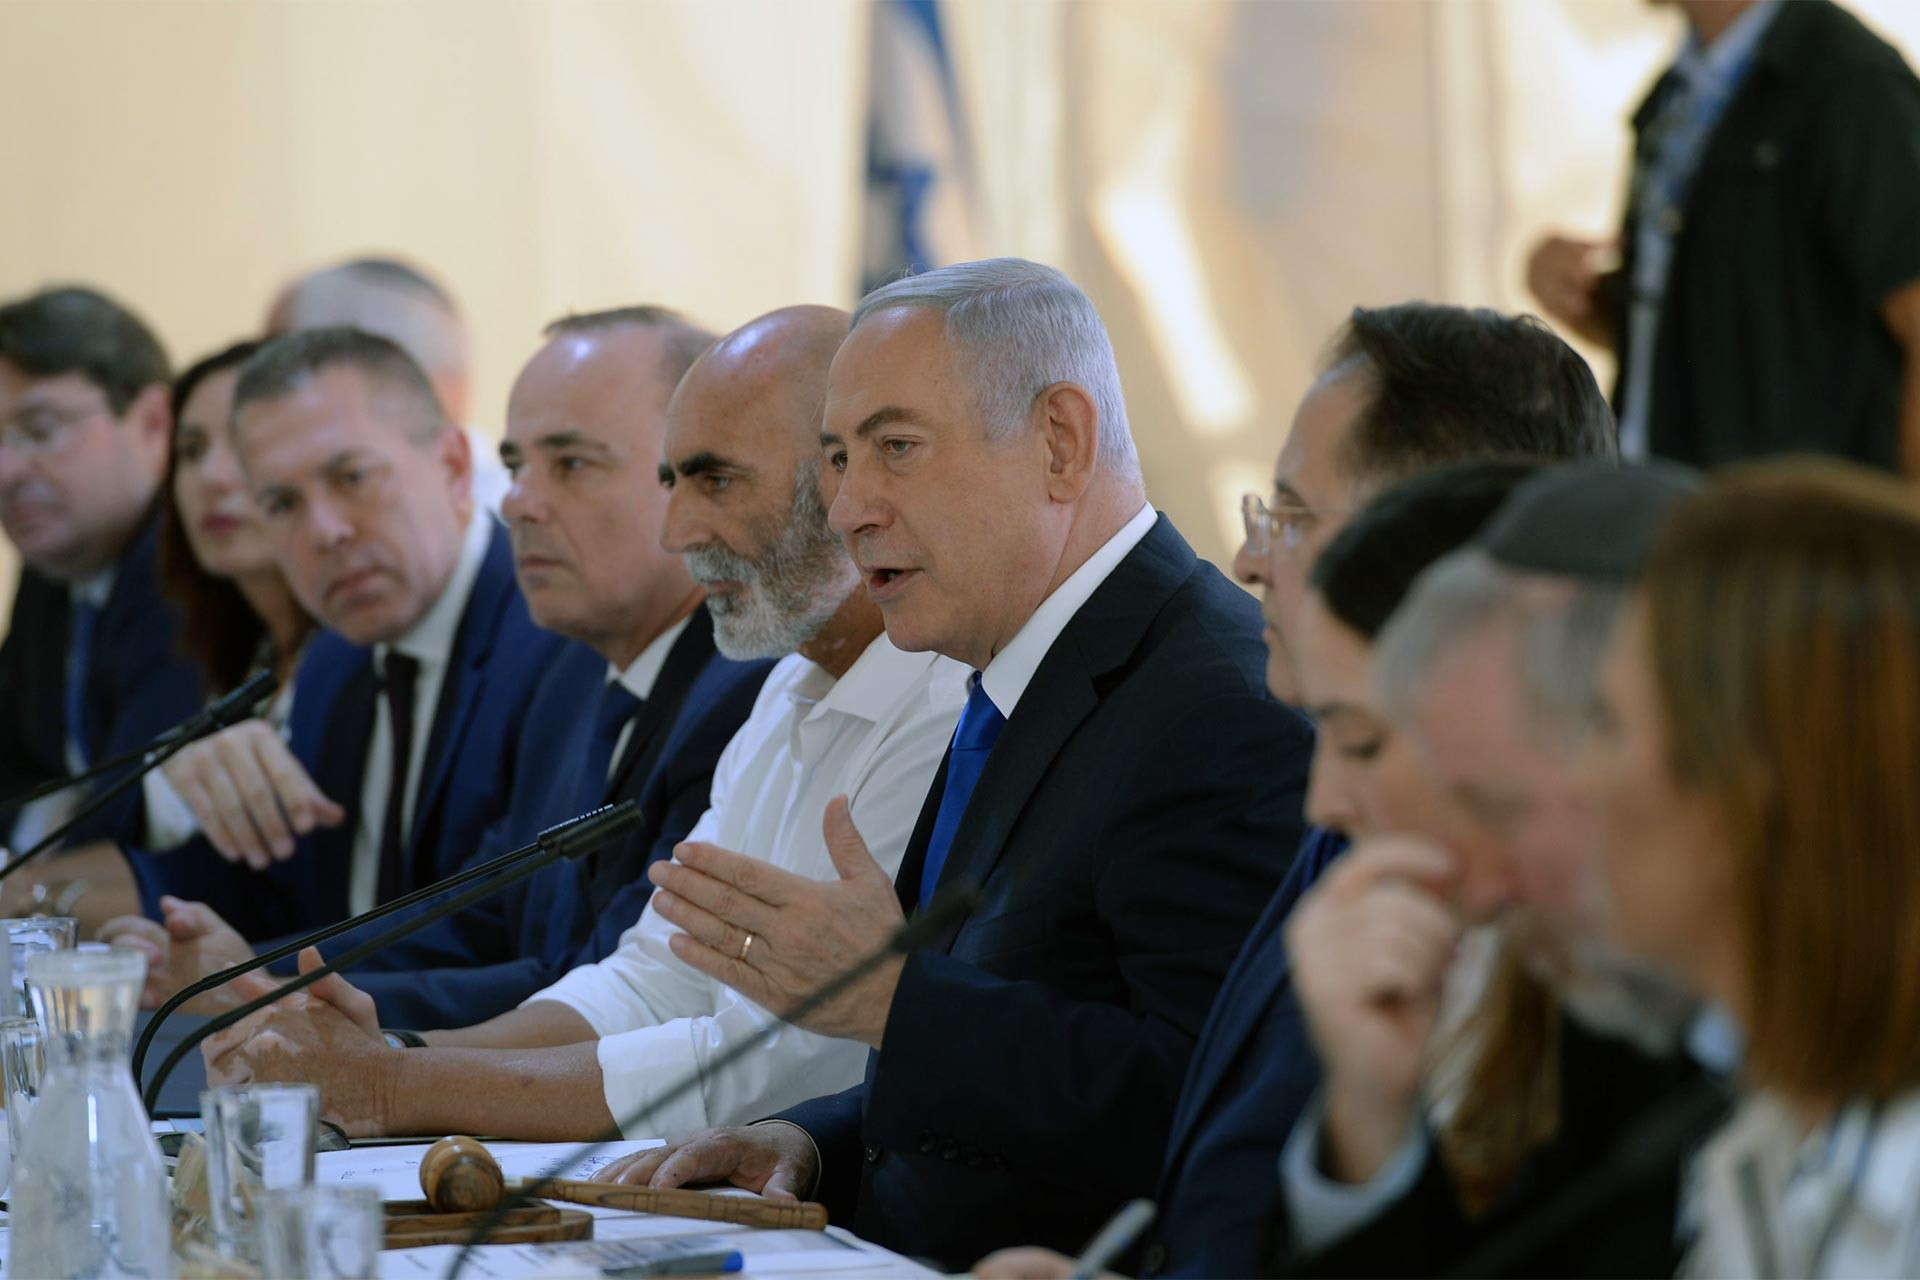 İsrail Başbakanı Binyamin Netanyahu'dan yeni 'ilhak' çıkışı